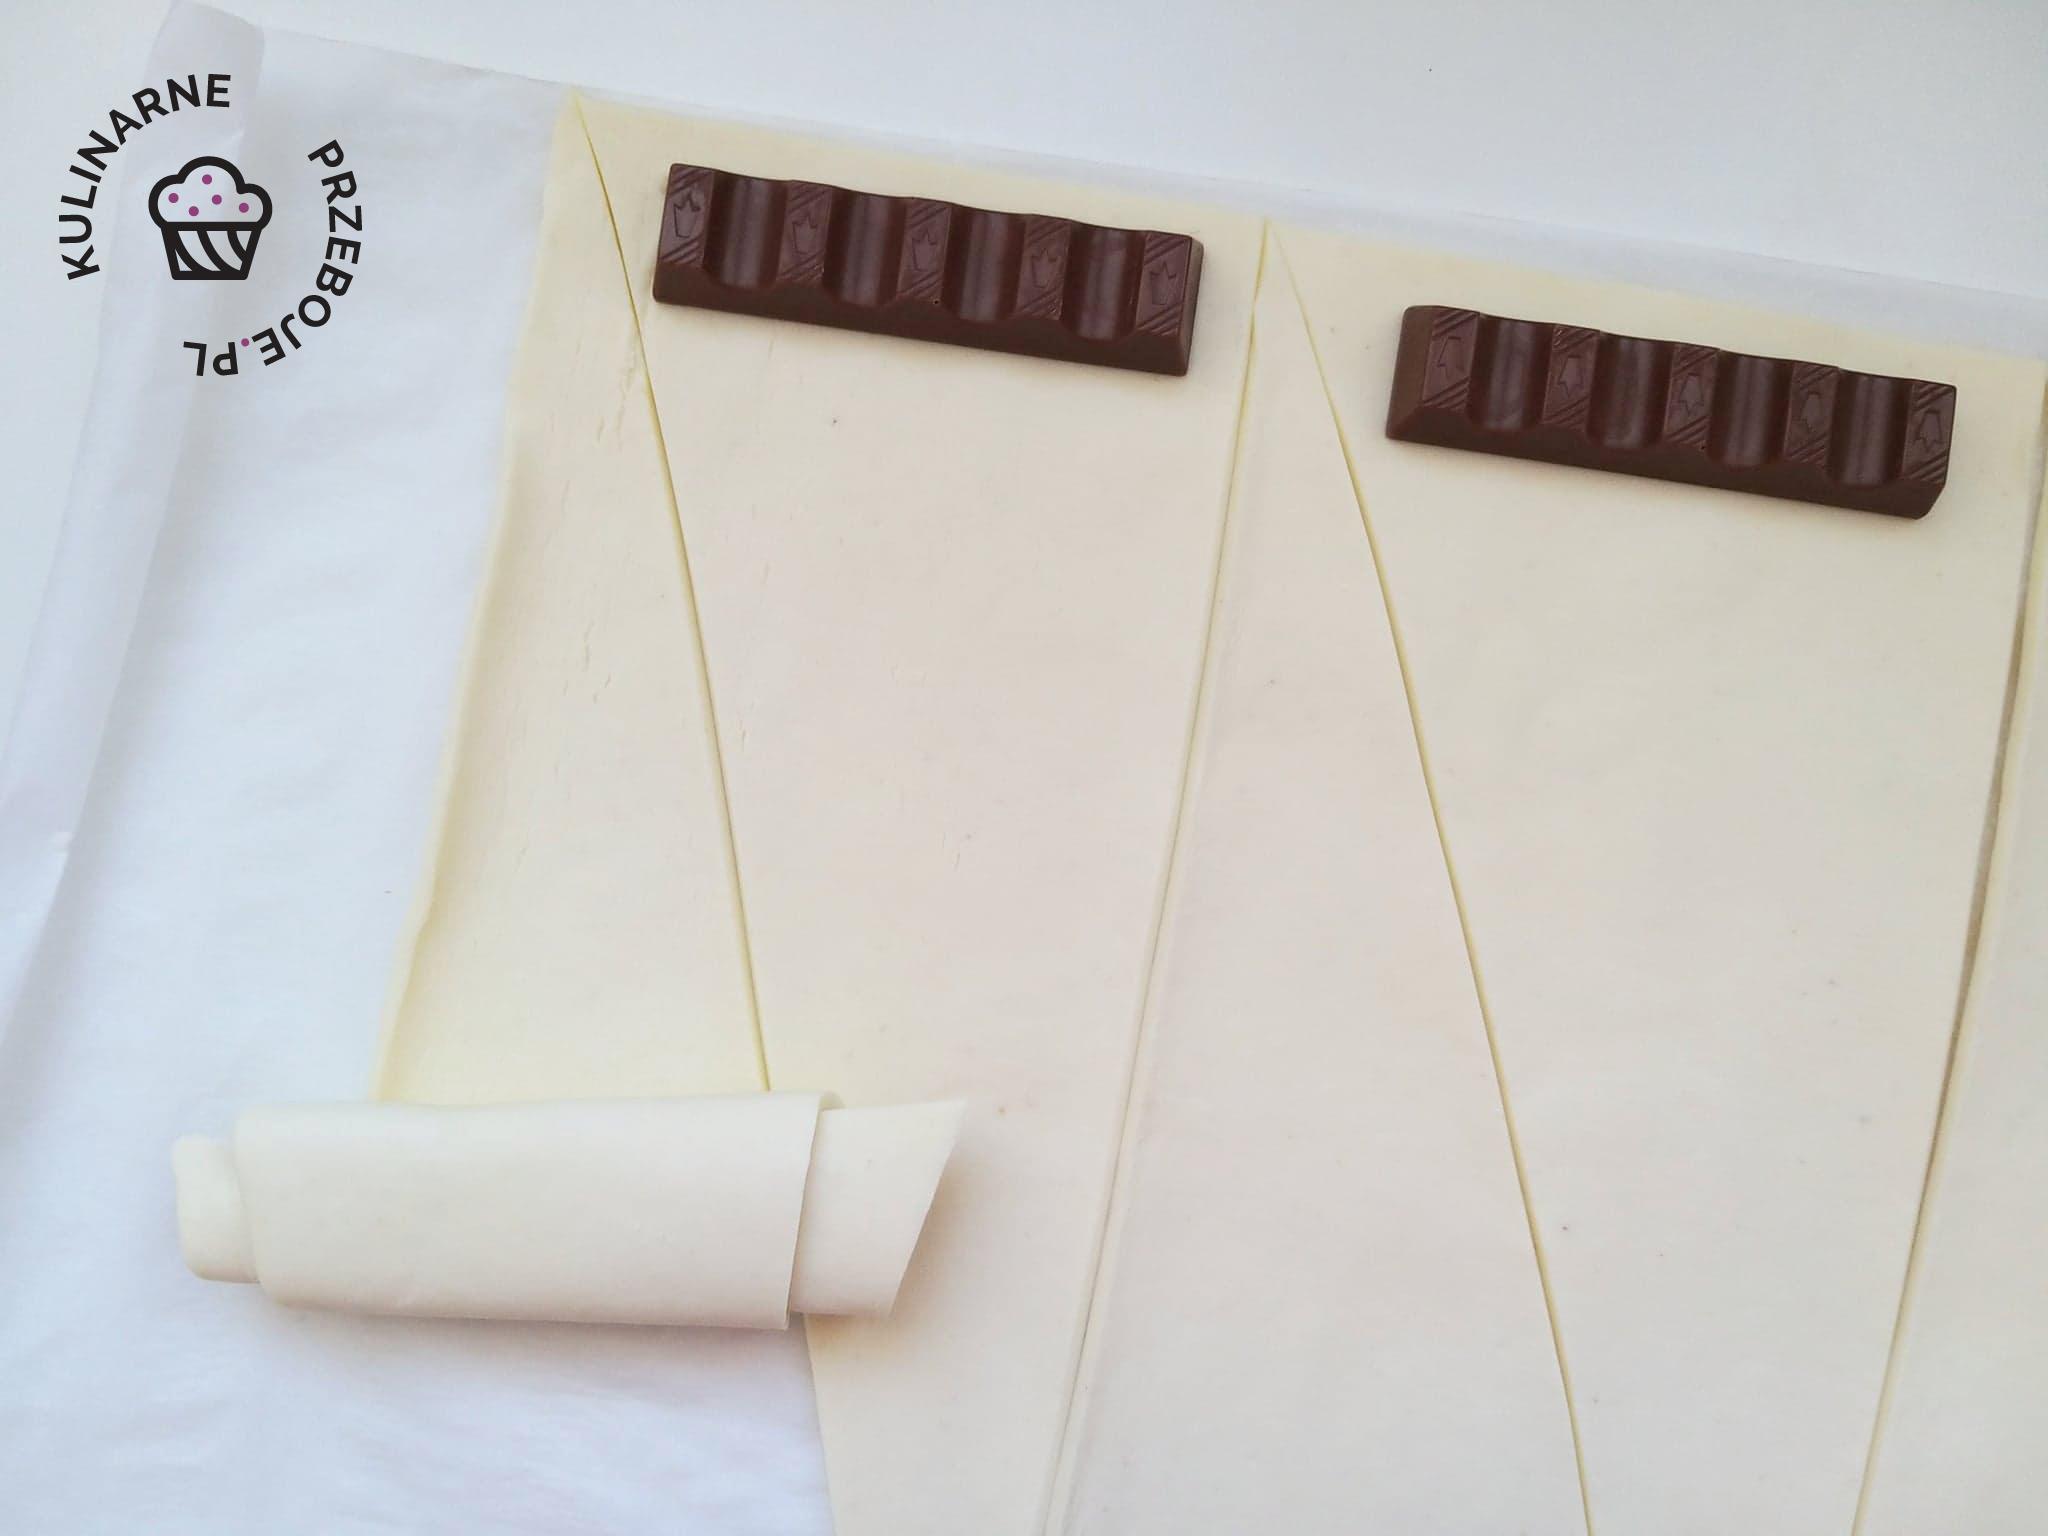 rogaliki z kinder czekolada